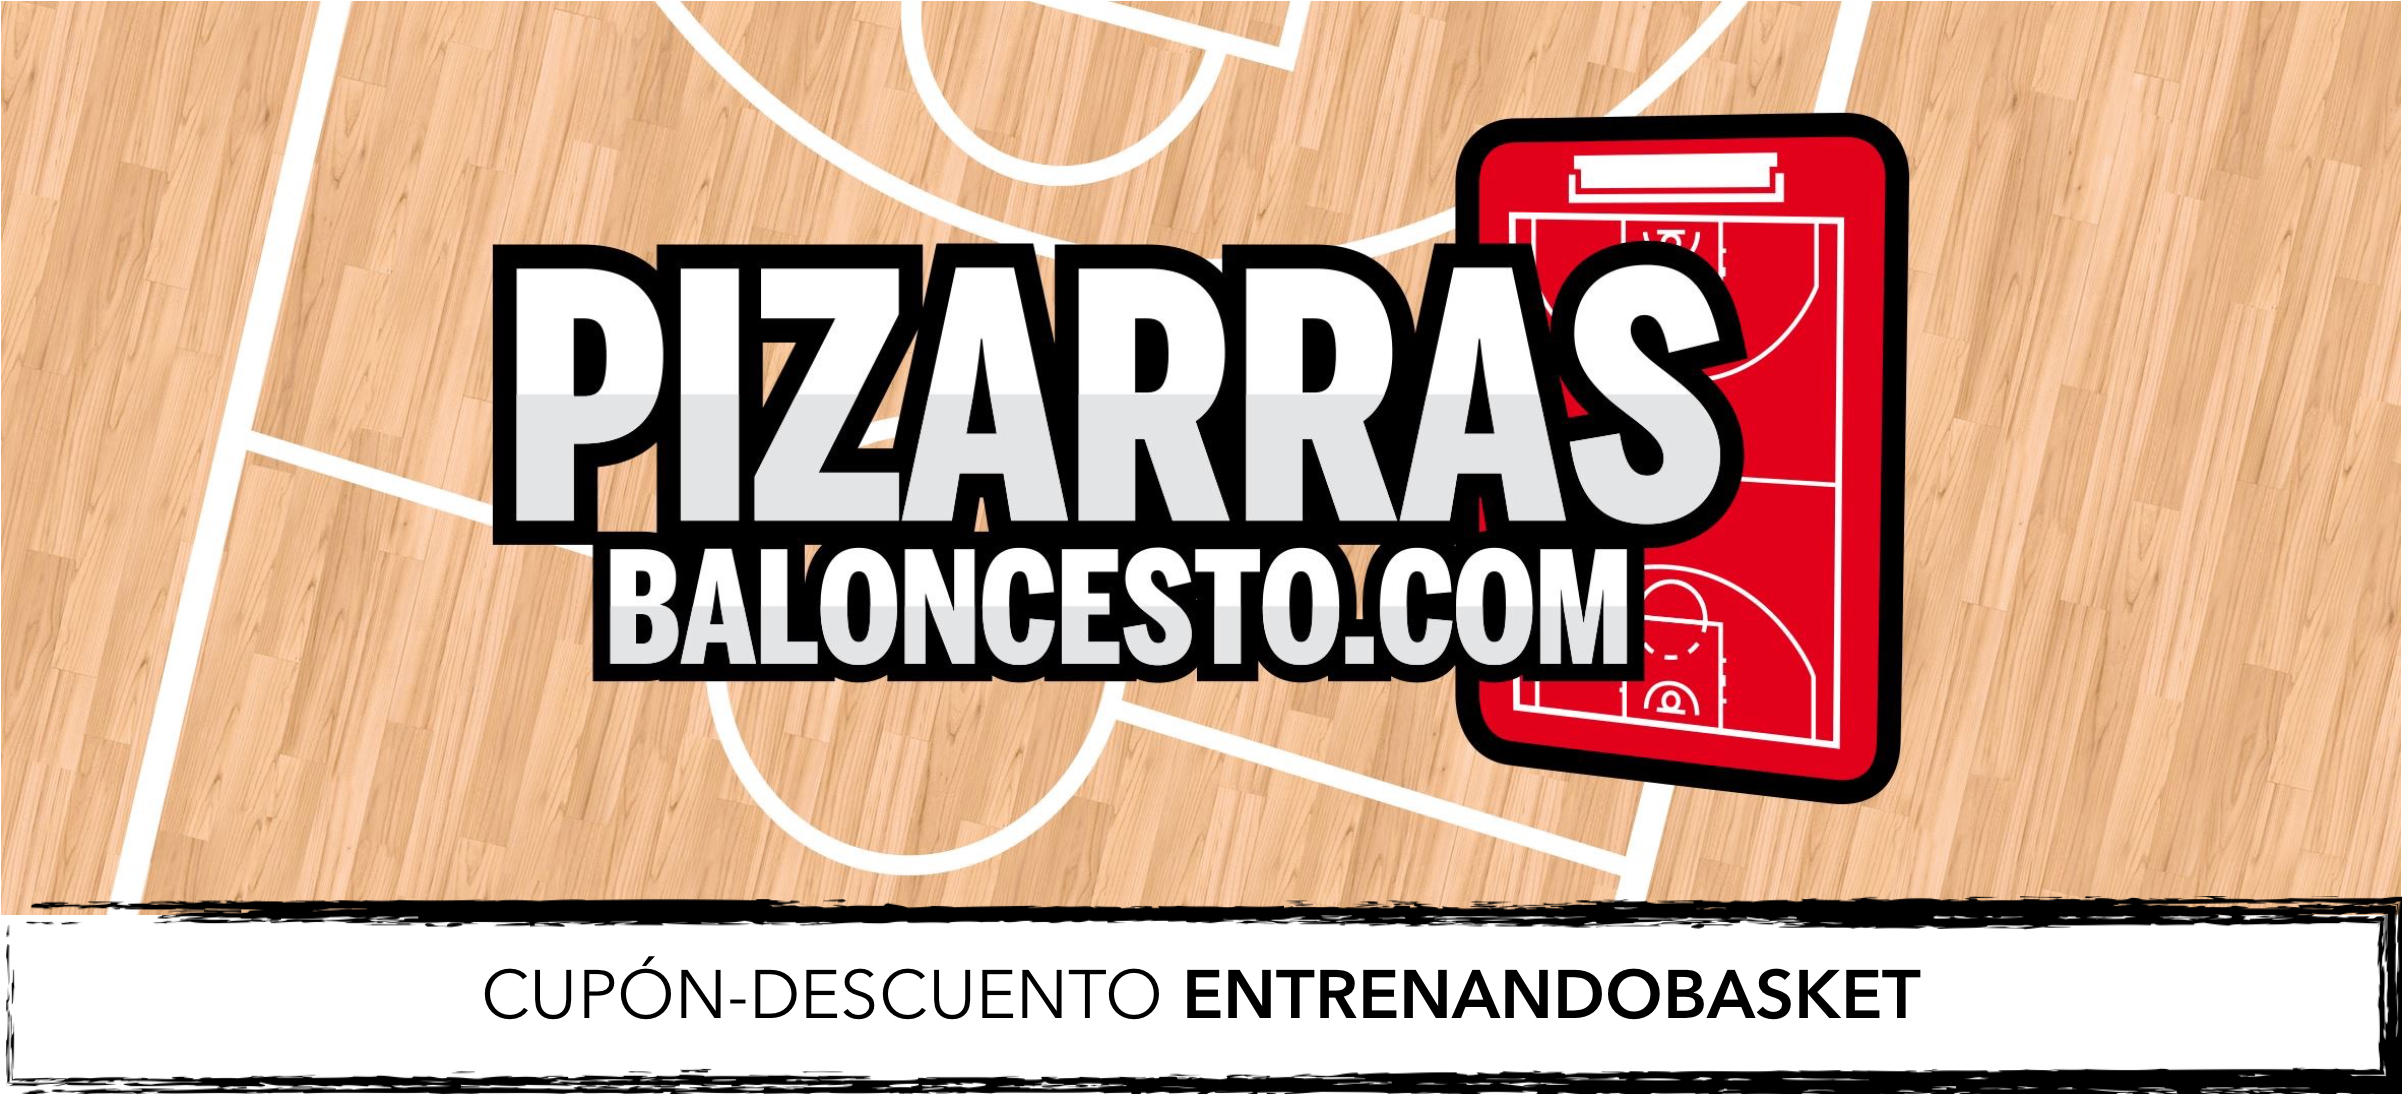 Pizarrasbaloncesto.com